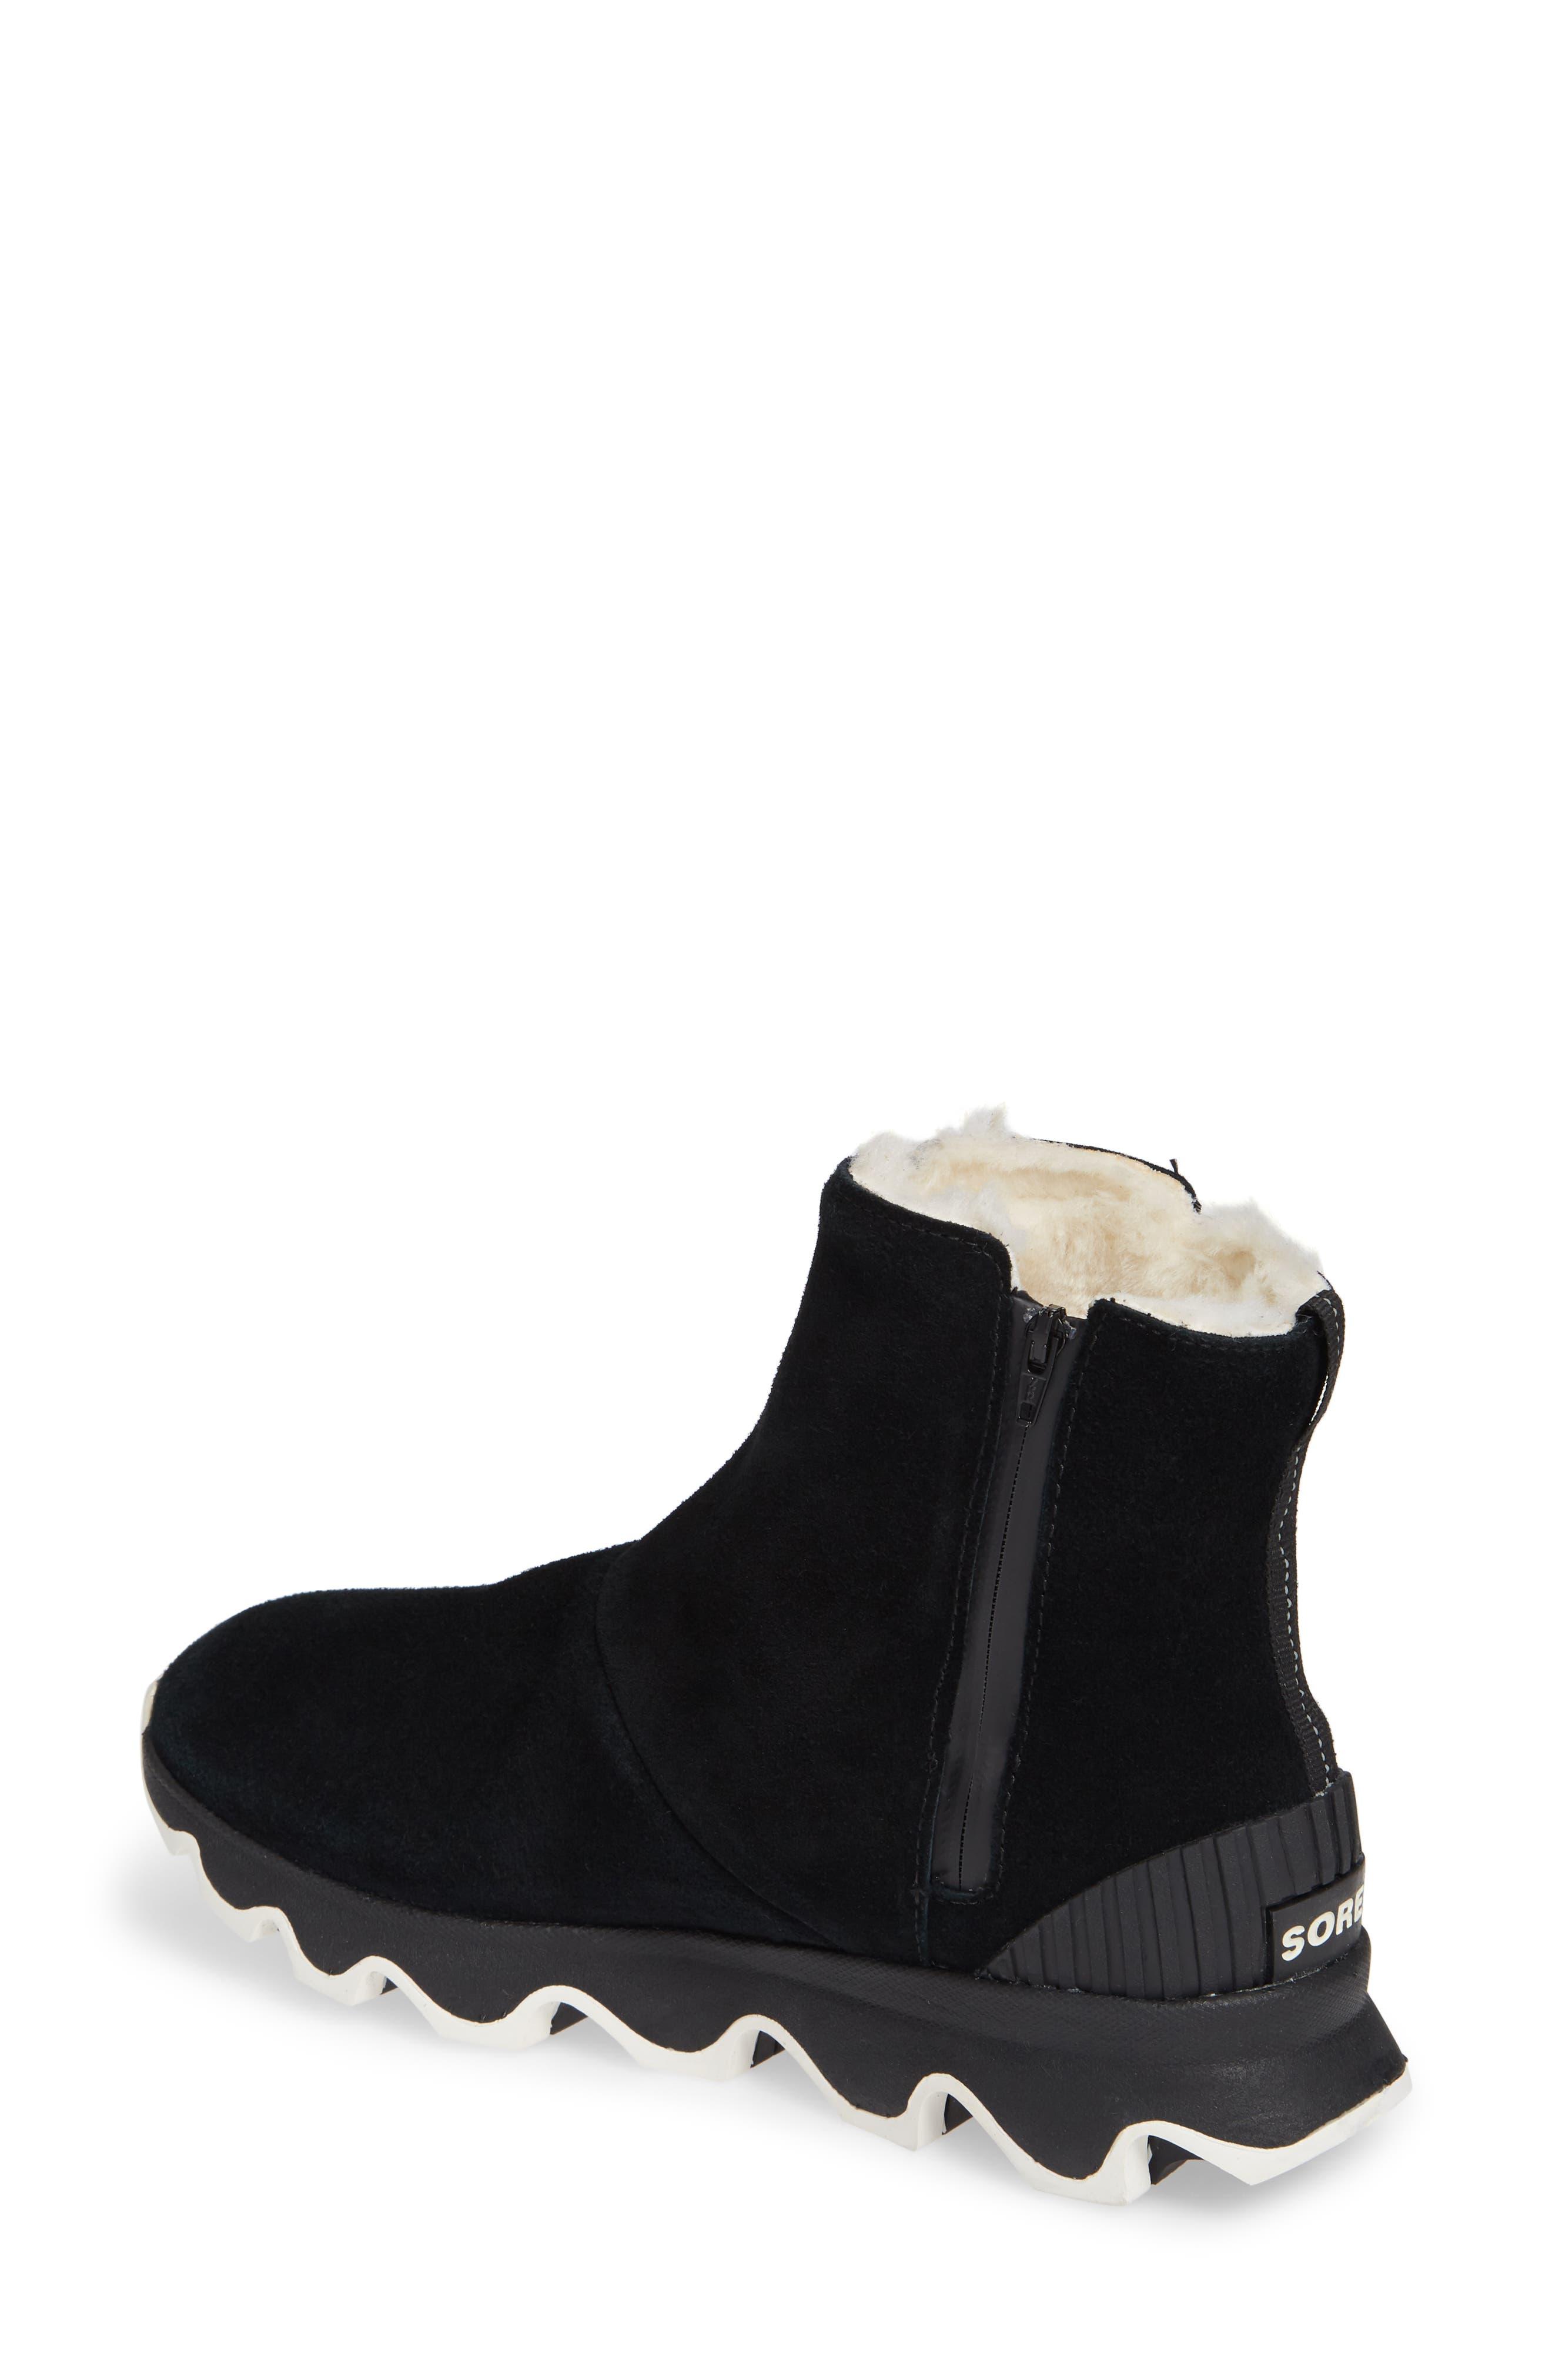 Kinetic Insulated Waterproof Short Boots,                             Alternate thumbnail 2, color,                             BLACK/ SEA SALT